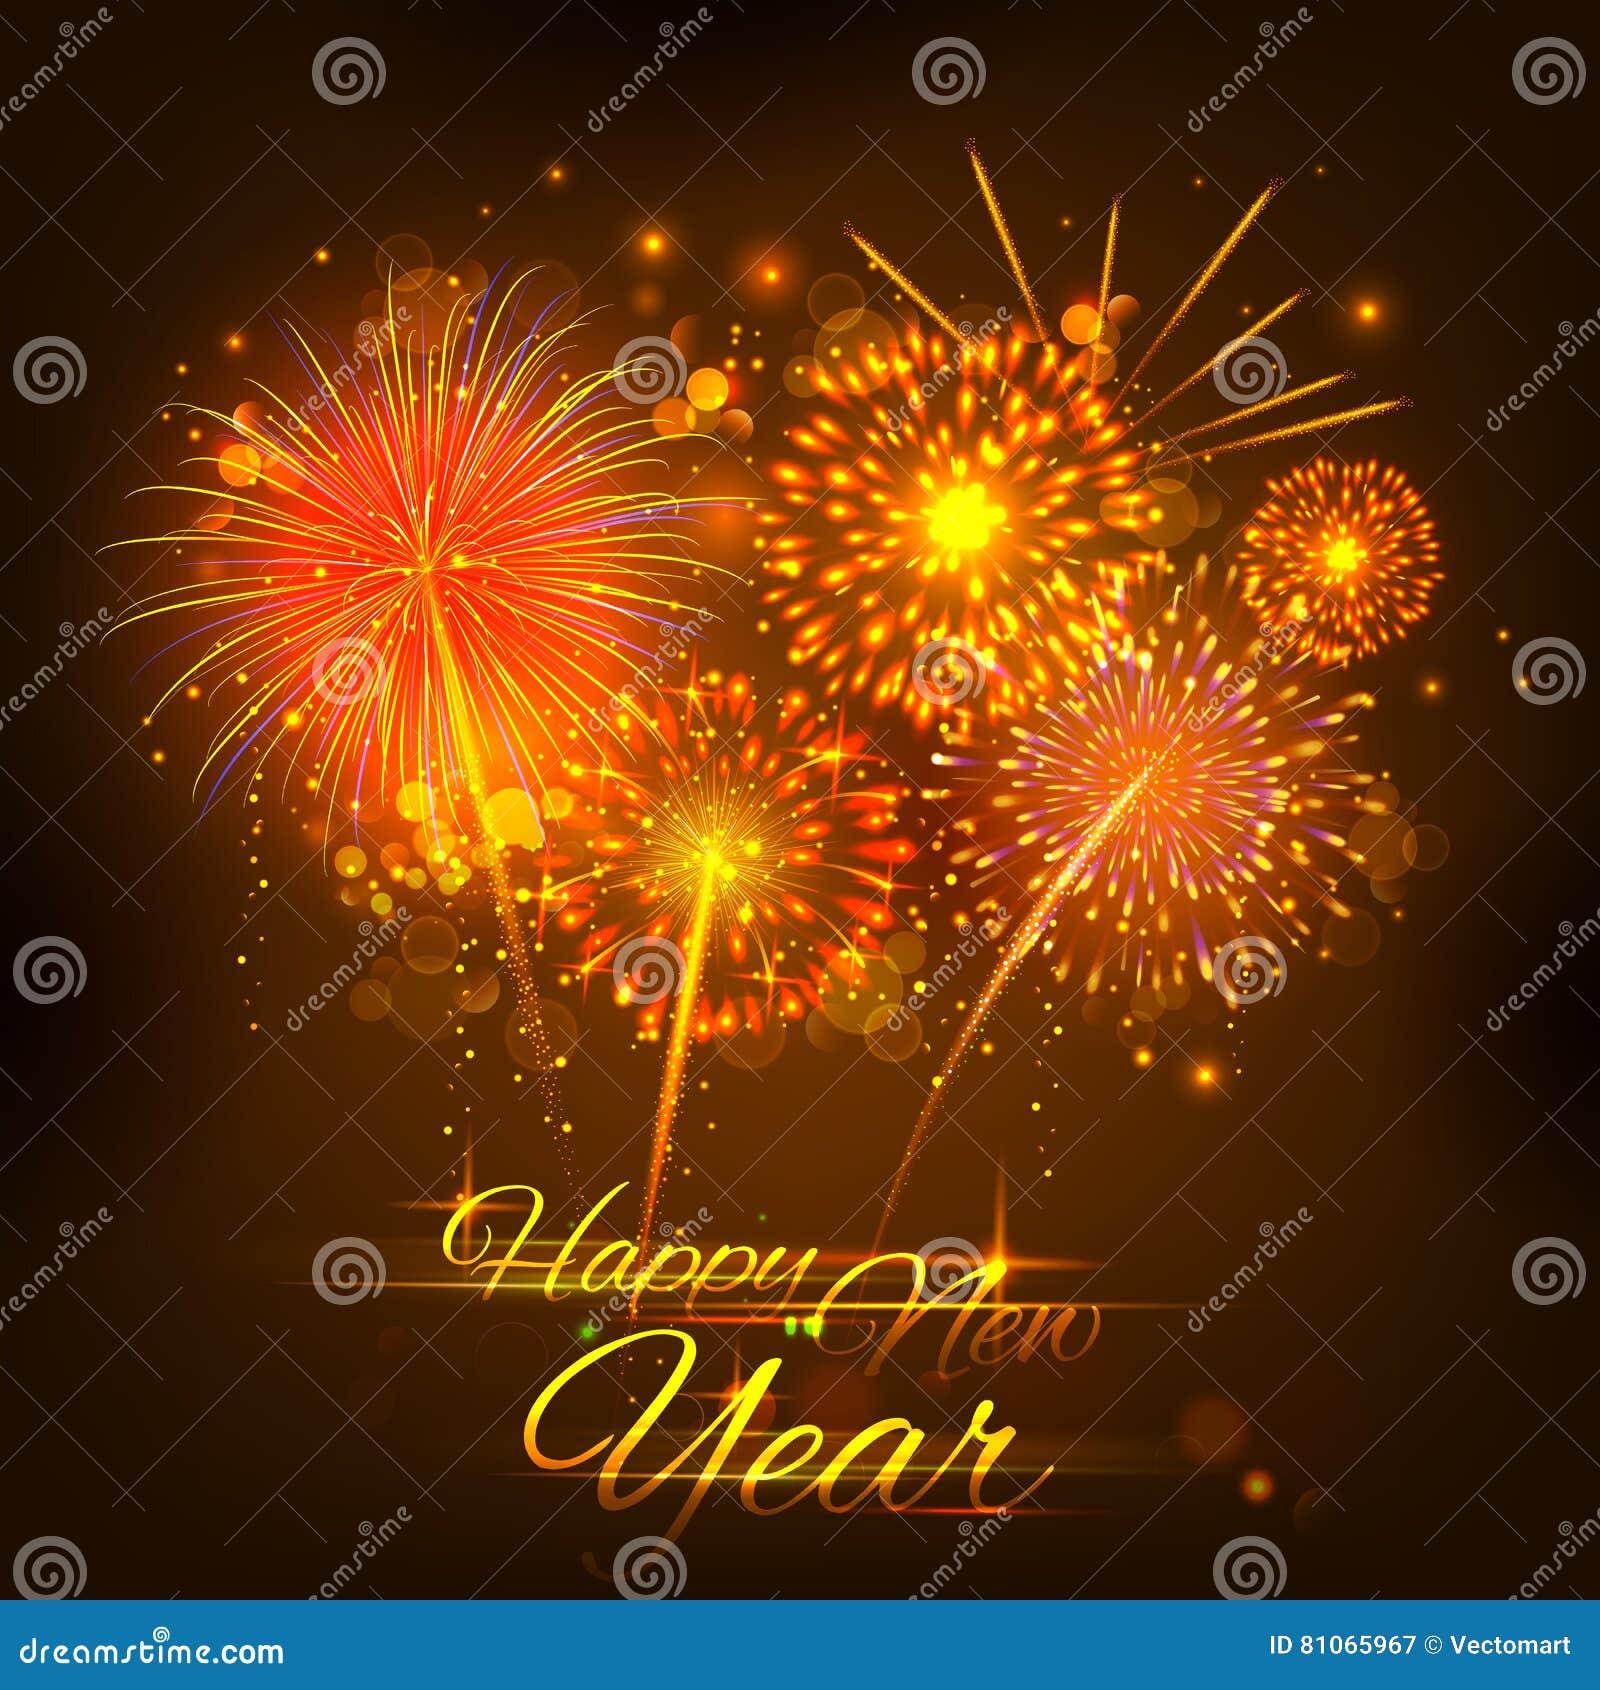 Happy New Year Celebration Abstract Starburst Seasons Greetings